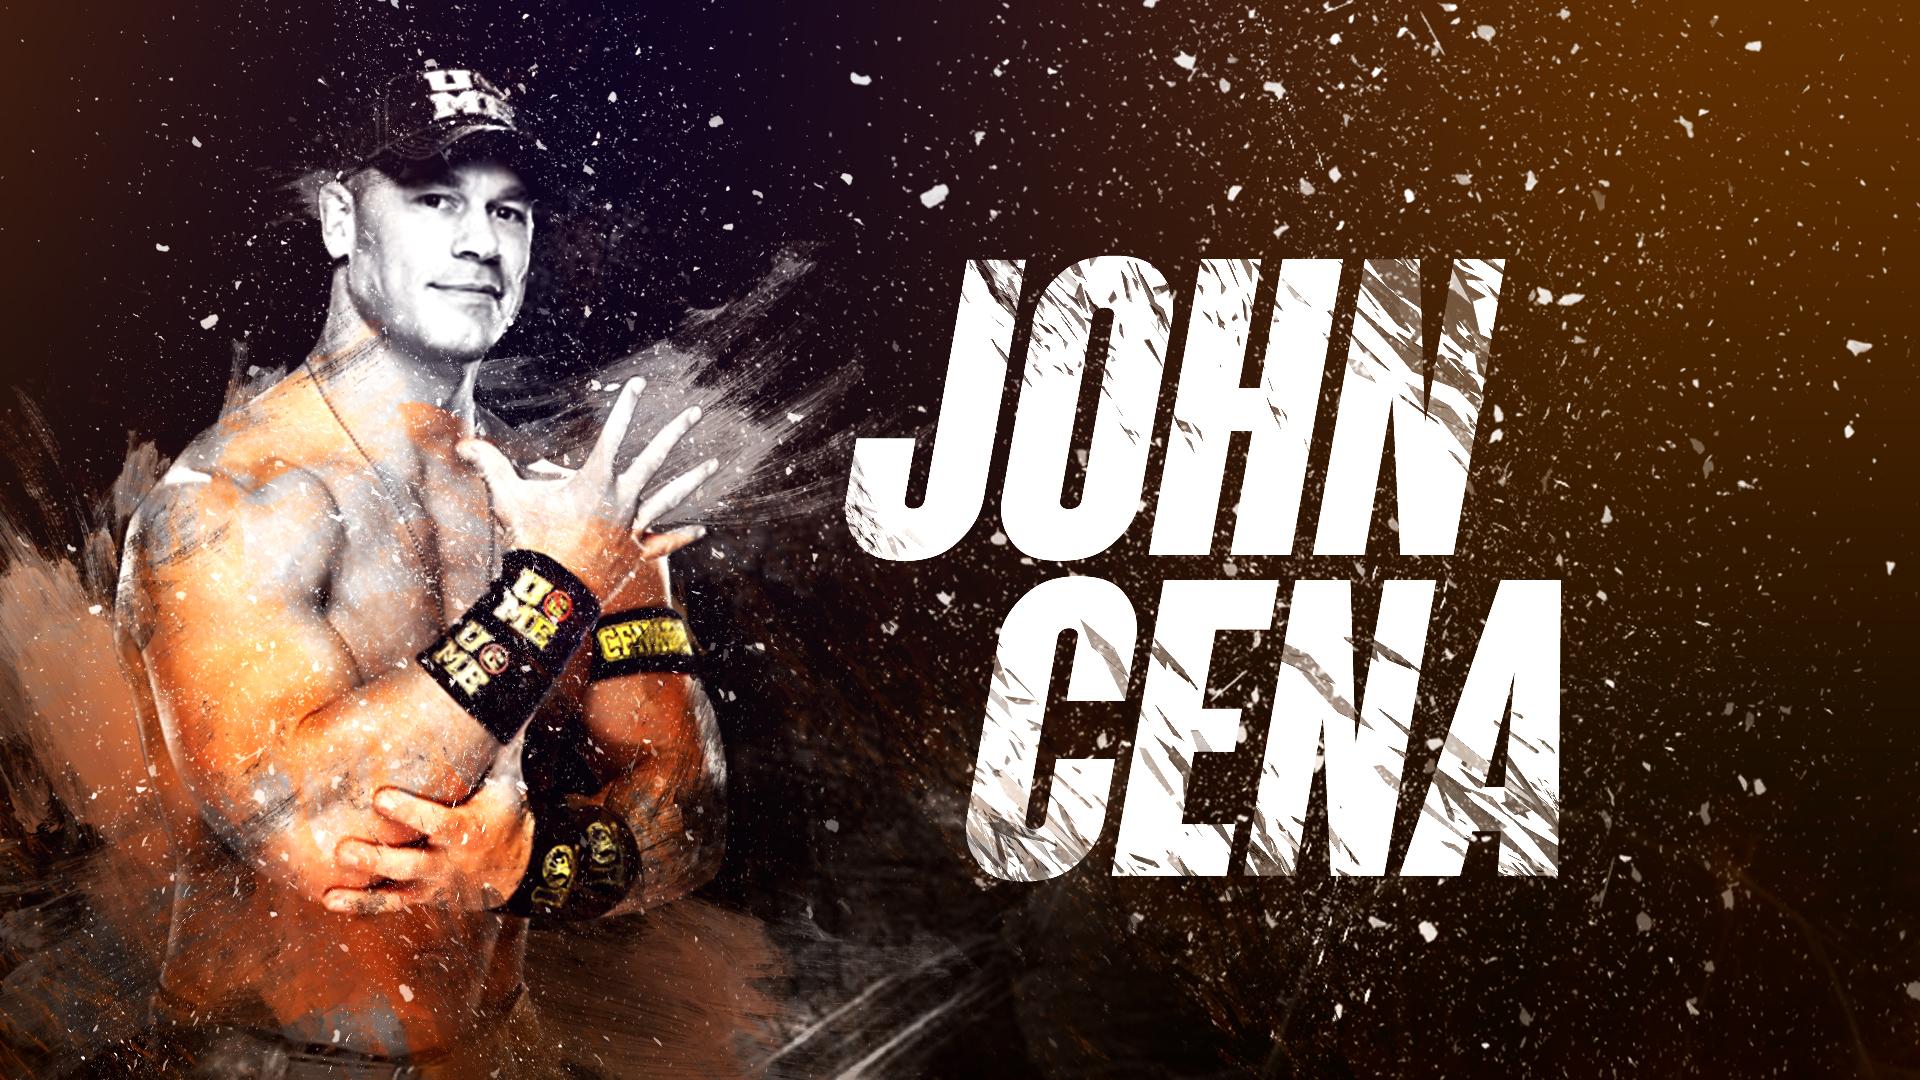 john cena wallpapers: 10 must downloads